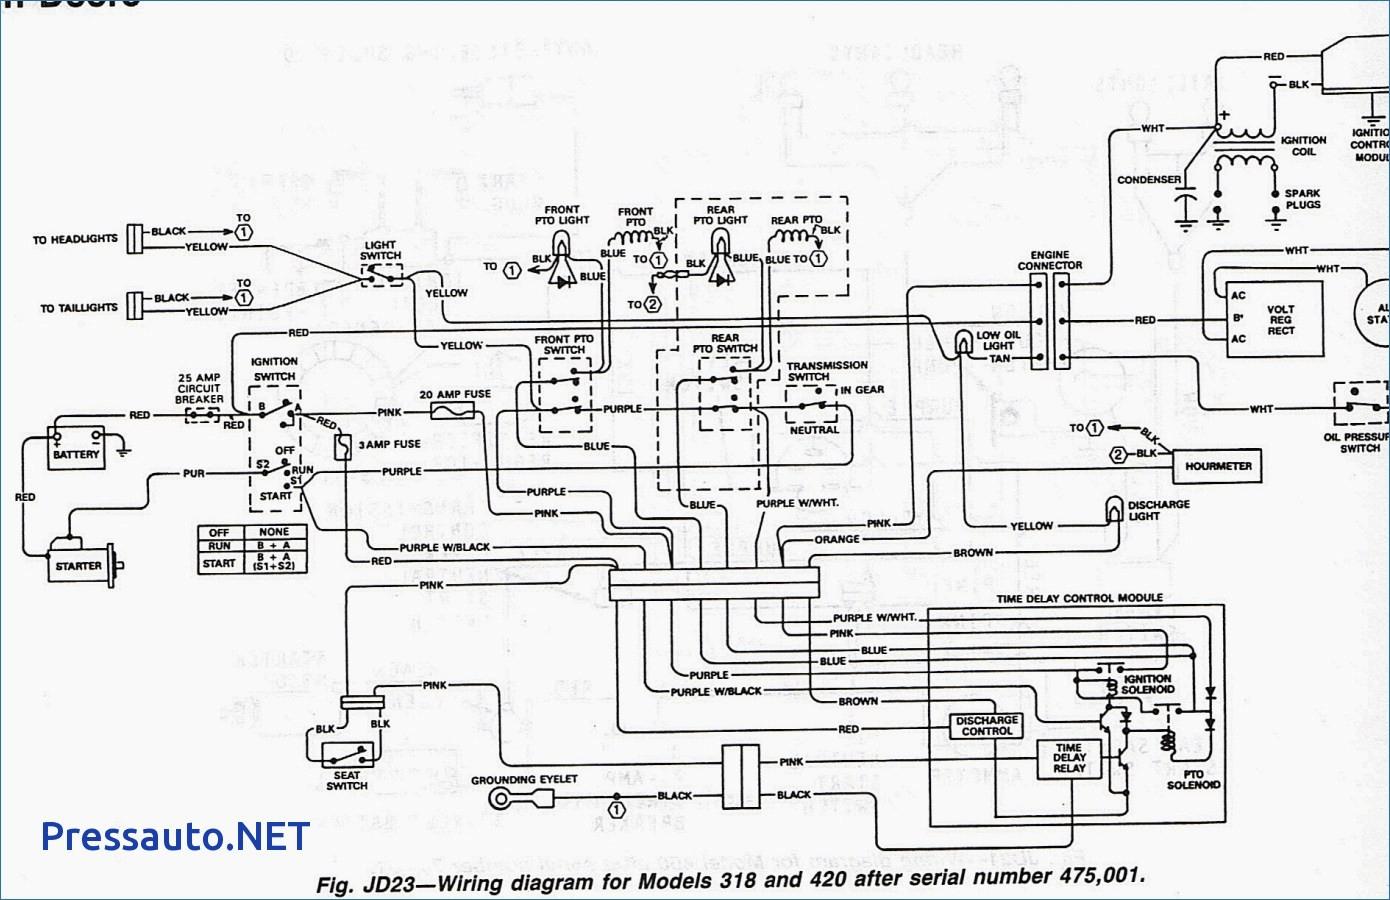 hight resolution of stx 38 pto switch wiring diagram wiring diagrams konsult john deere stx38 wiring diagram wiring diagram